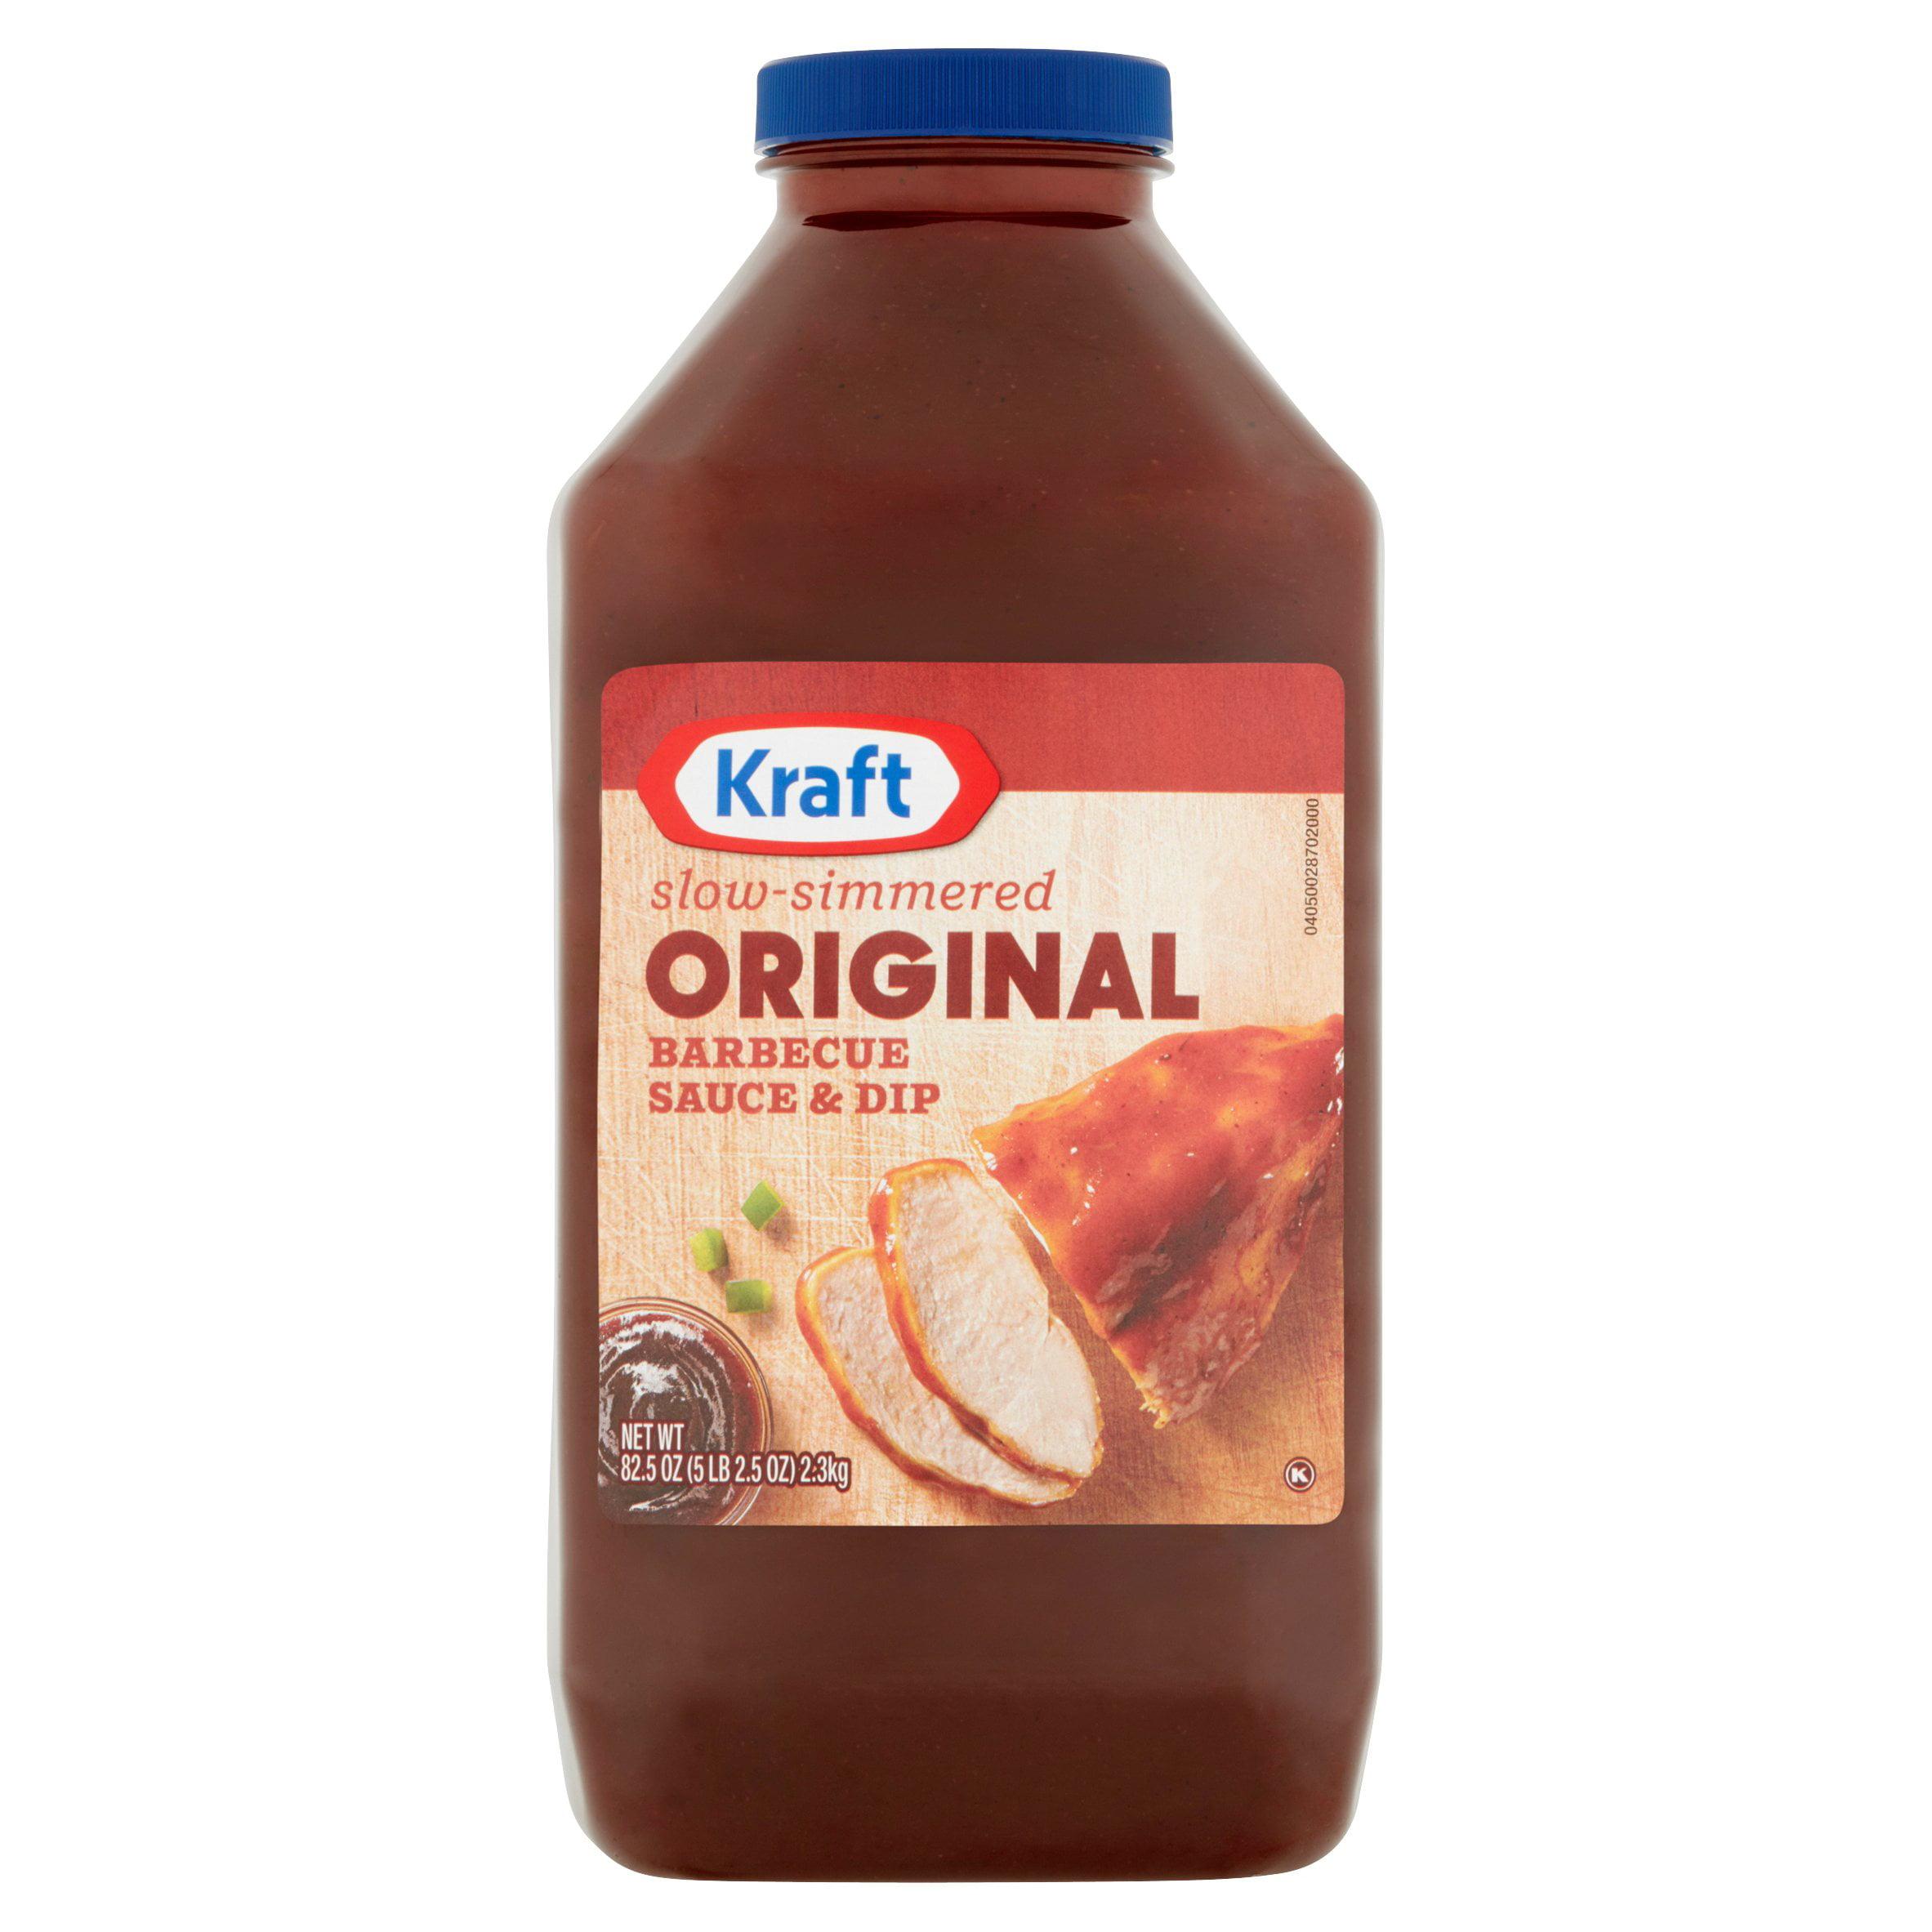 Kraft Original Barbecue Sauce and Dip, 82.5 oz